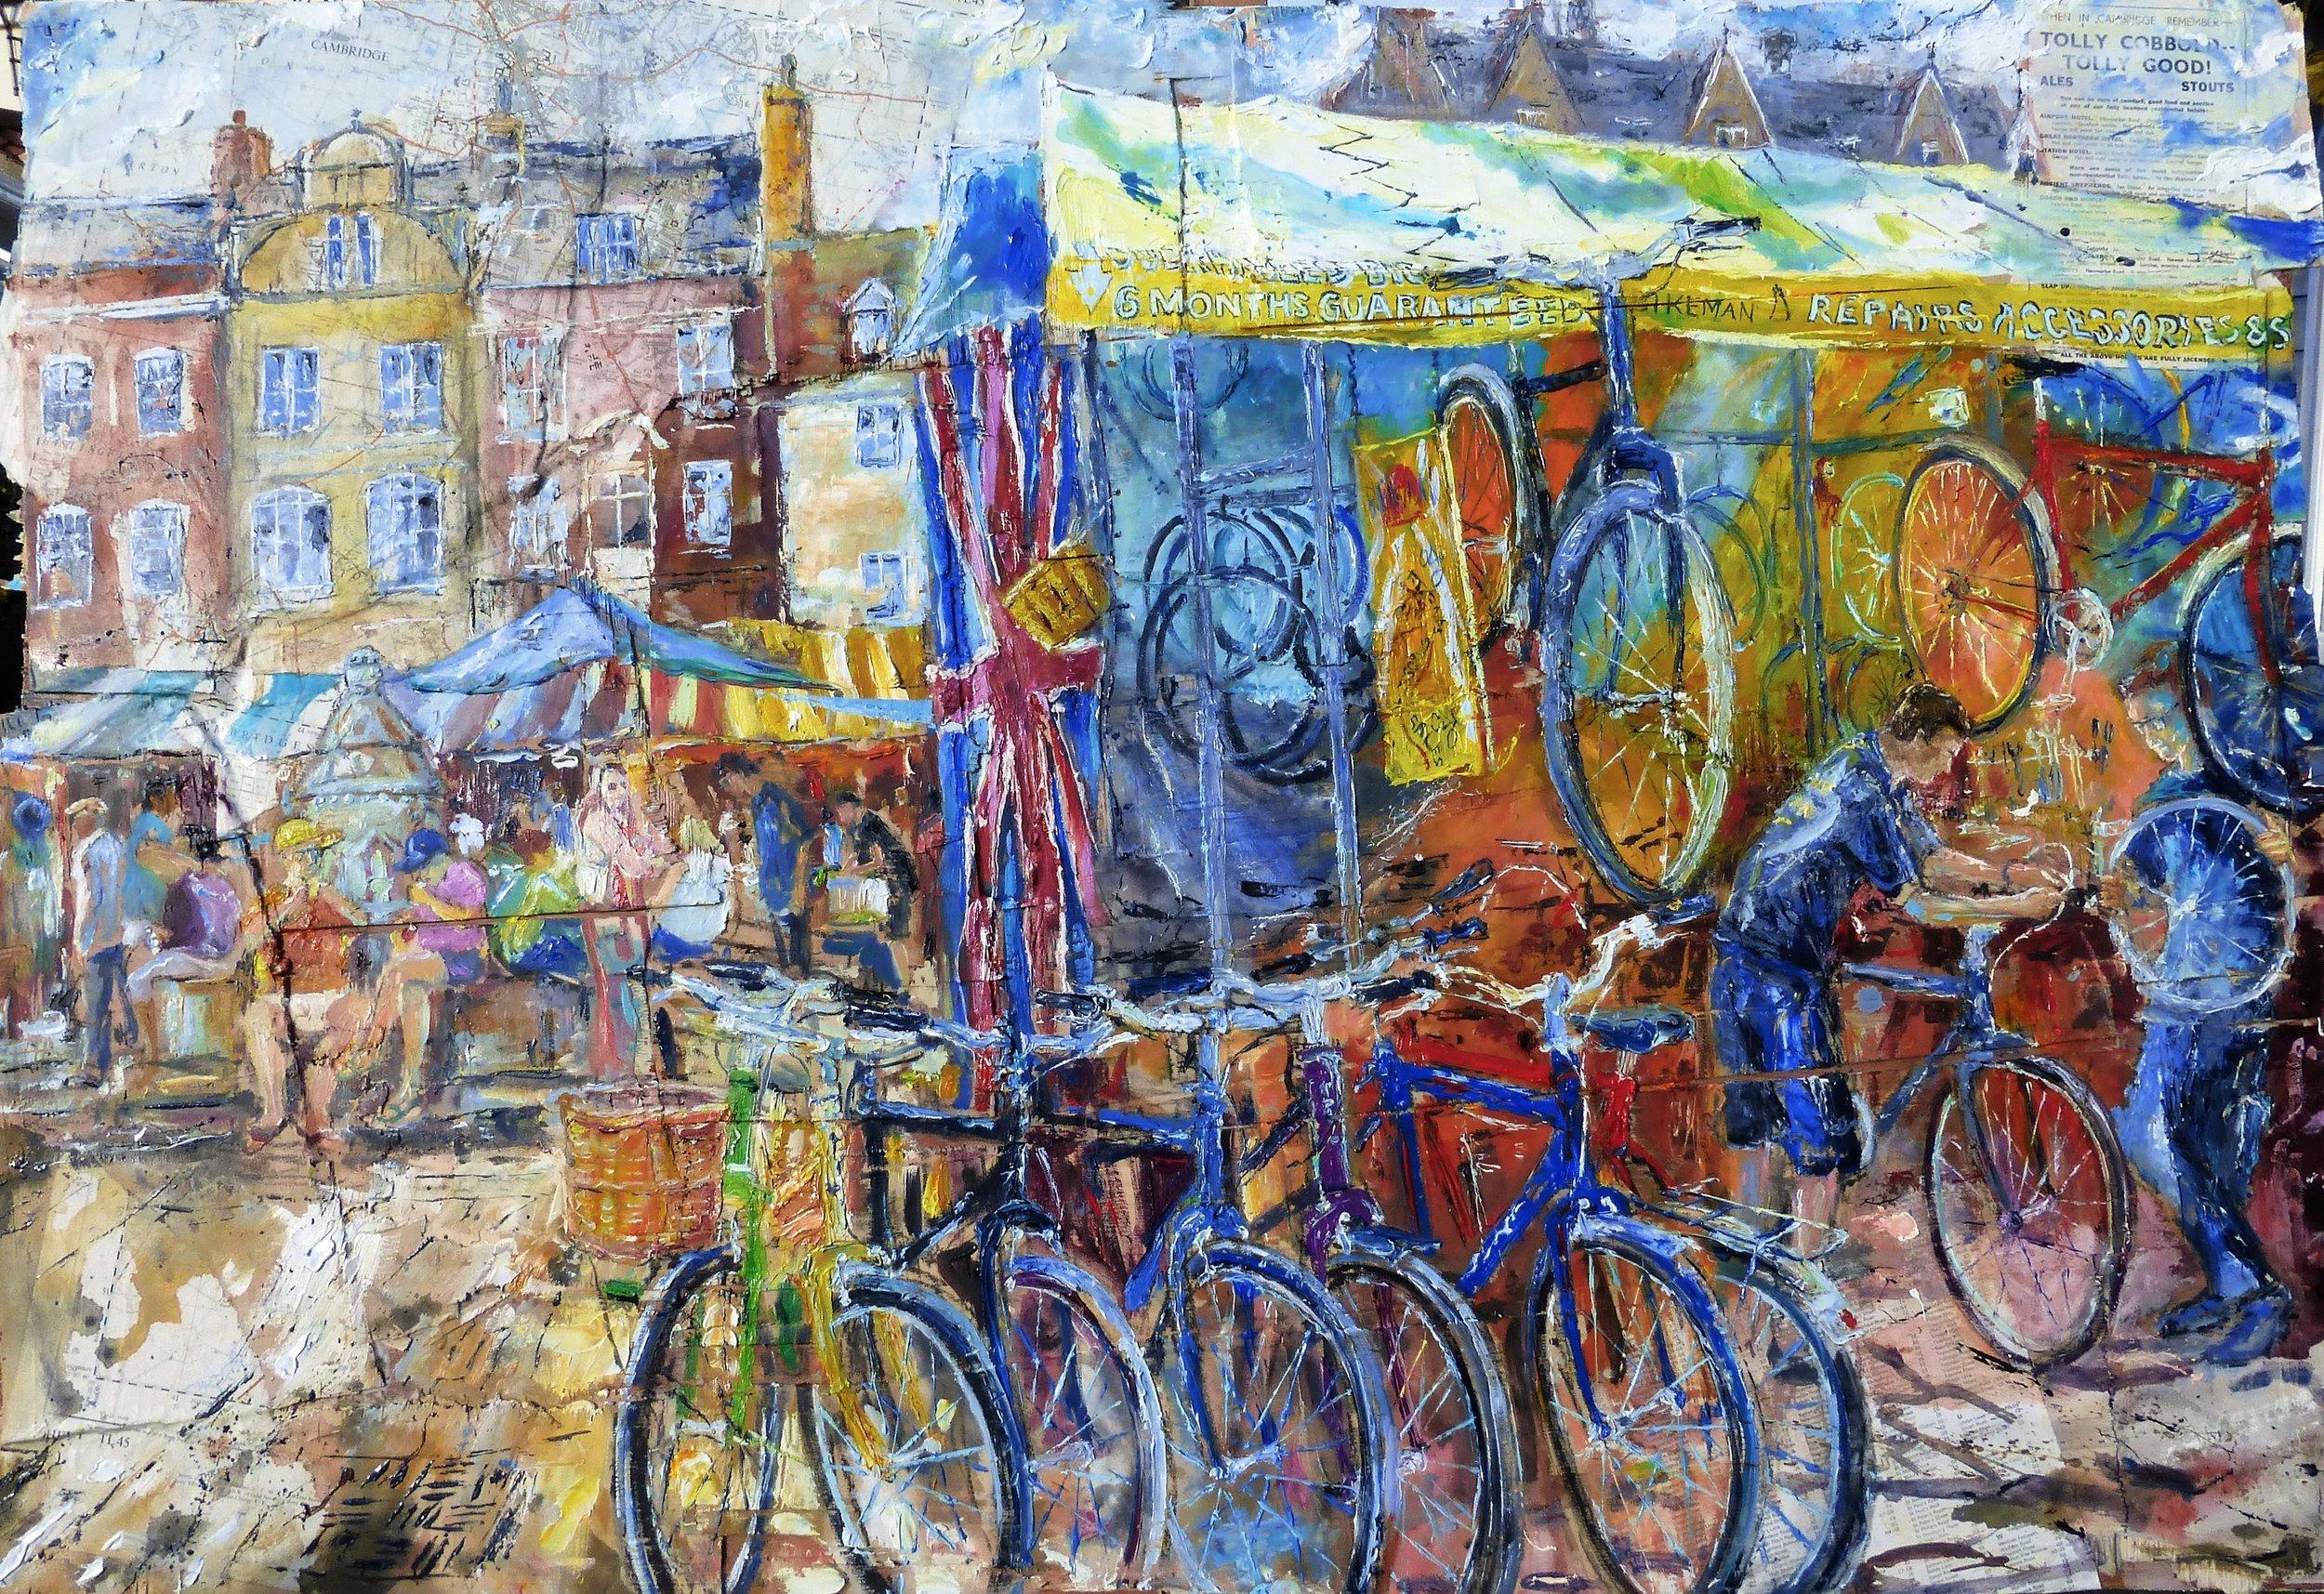 Market Hill, The Bikeman, Cambridge